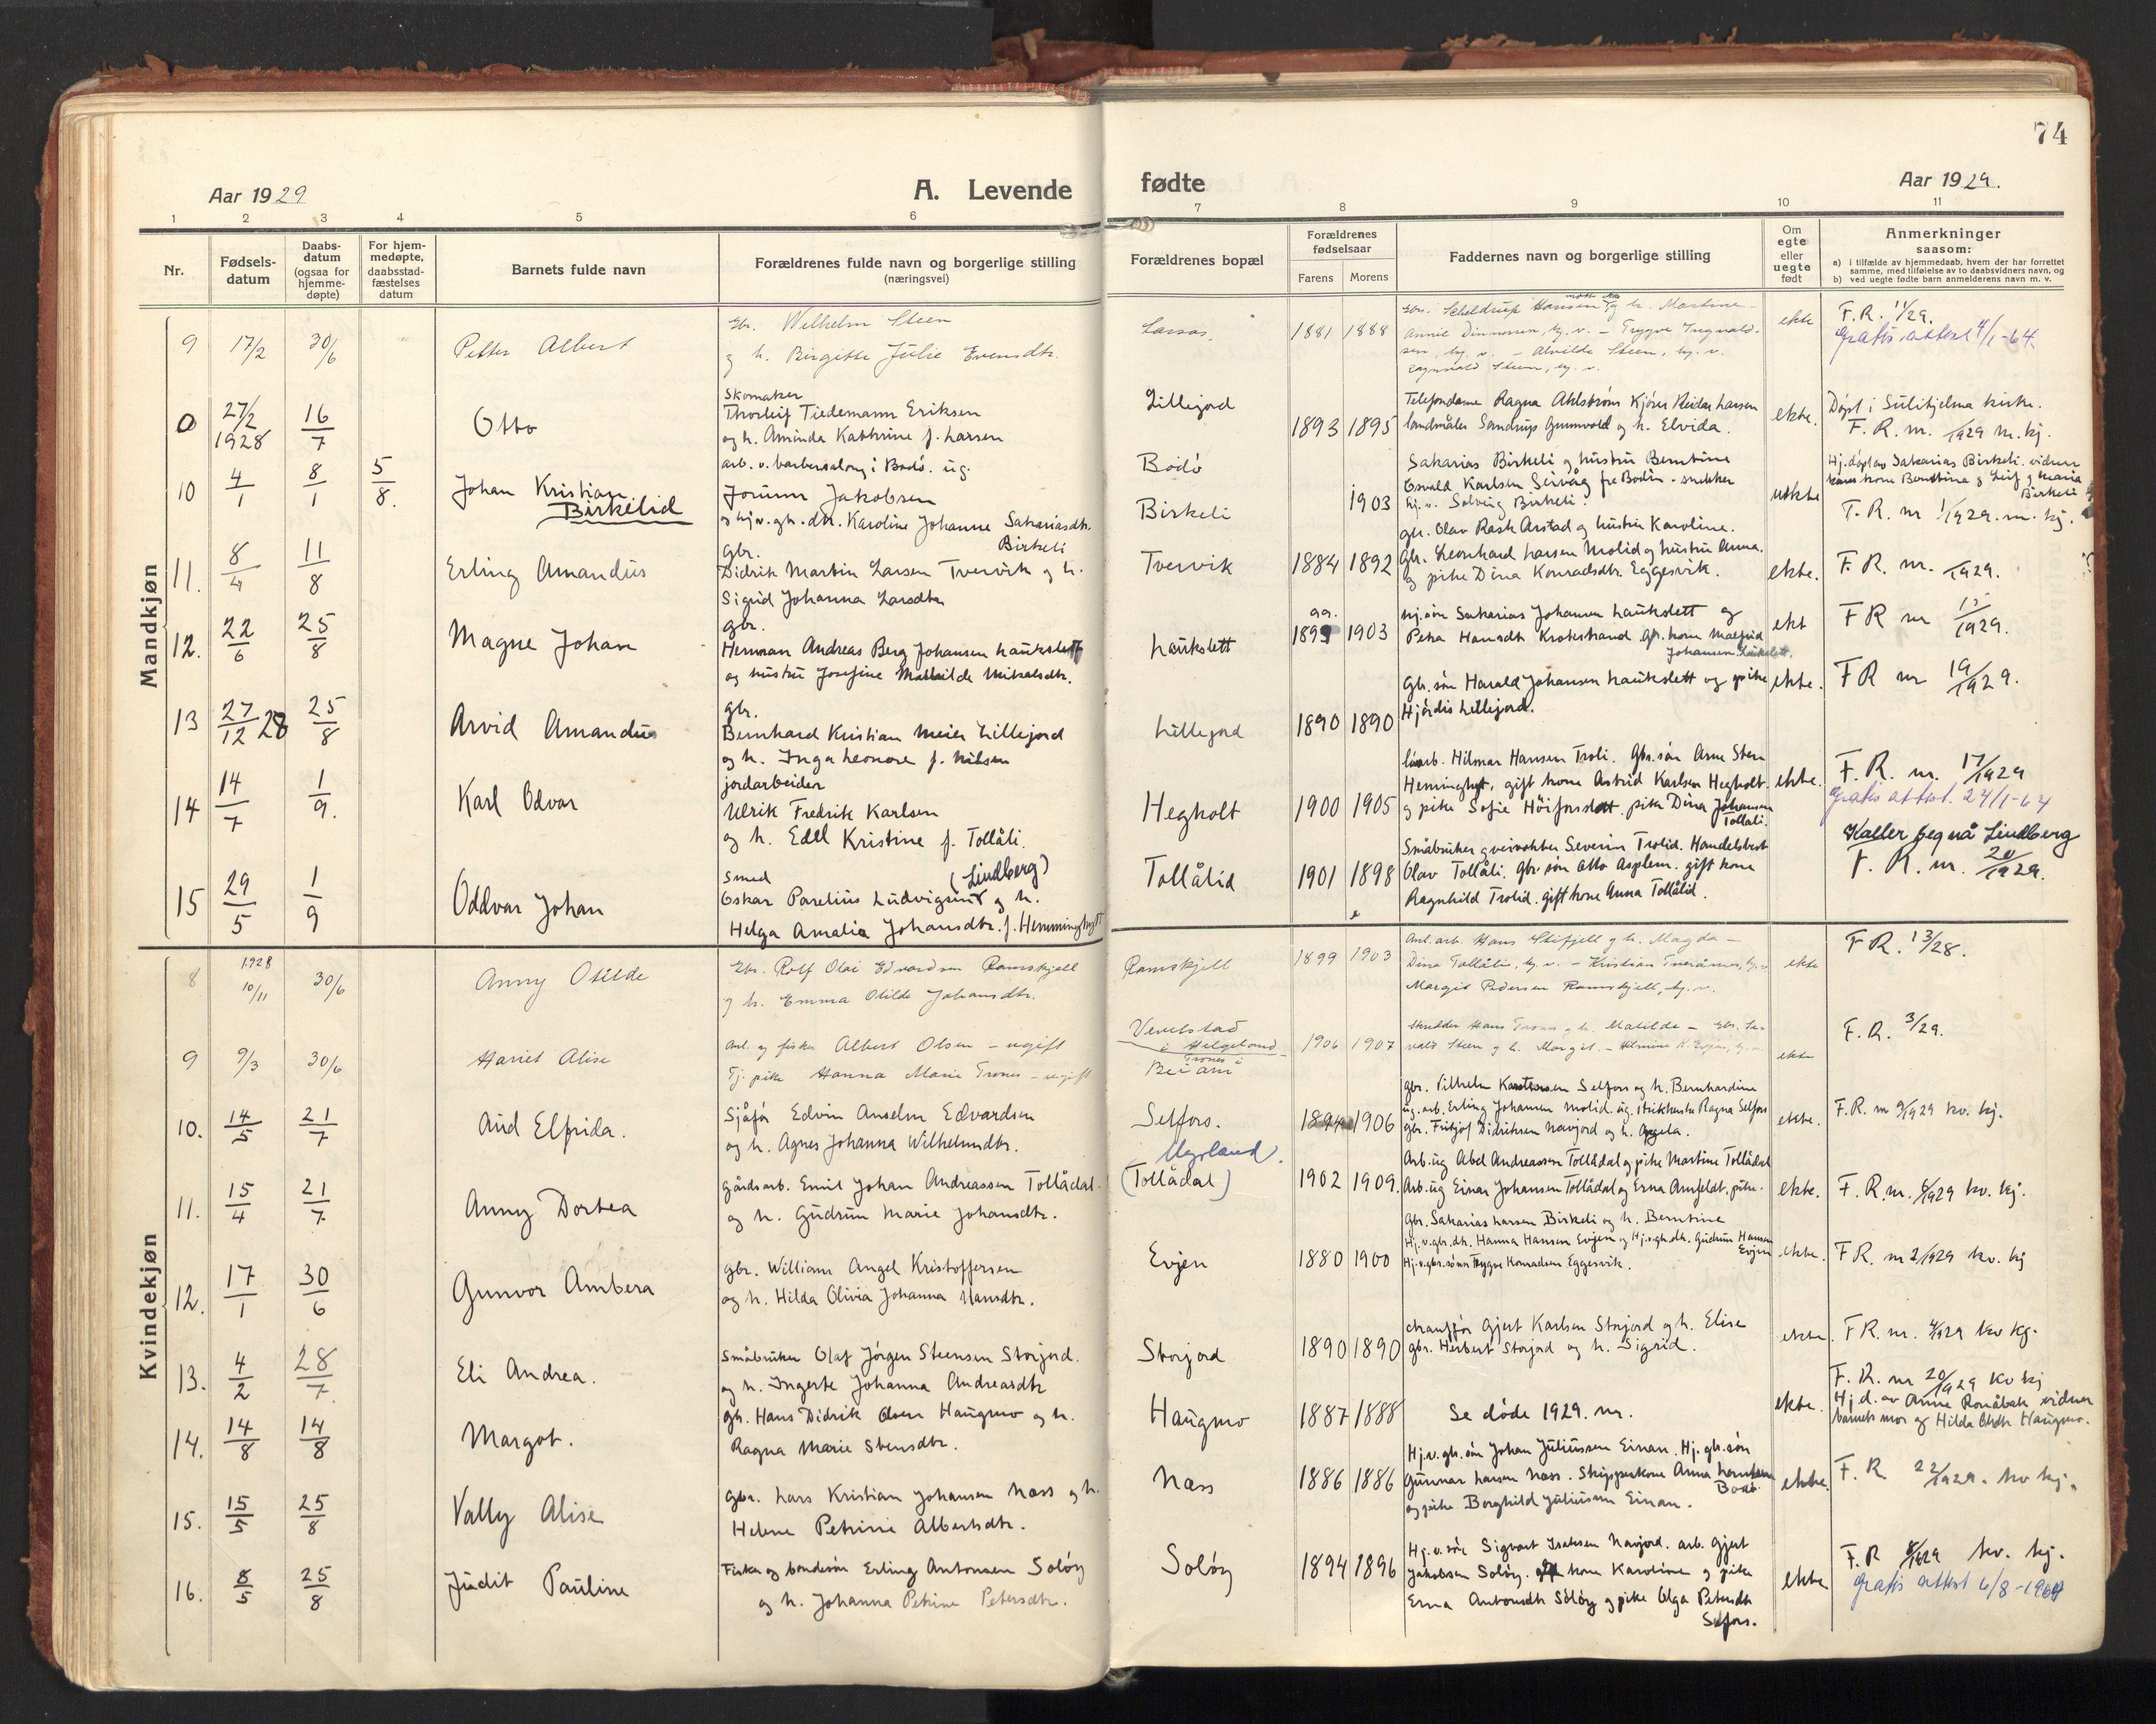 SAT, Ministerialprotokoller, klokkerbøker og fødselsregistre - Nordland, 846/L0650: Ministerialbok nr. 846A08, 1916-1935, s. 74